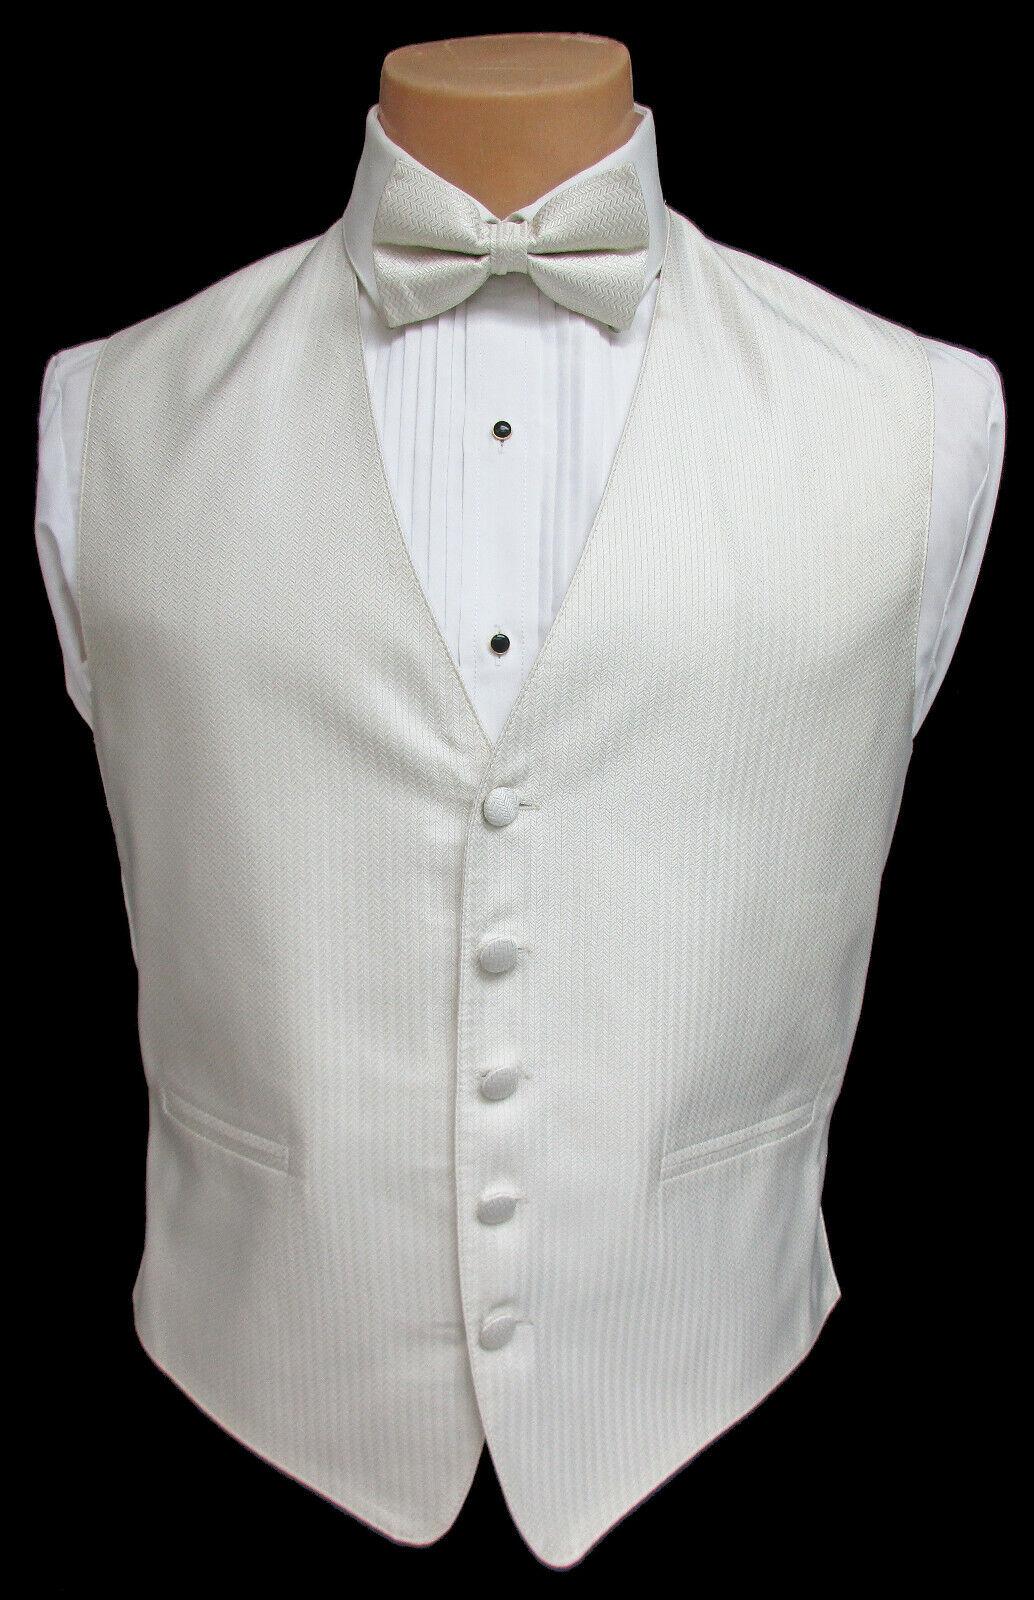 Men's Ivory Herringbone Fullback Tuxedo Vest and Tie Set Wedding Cruise Prom